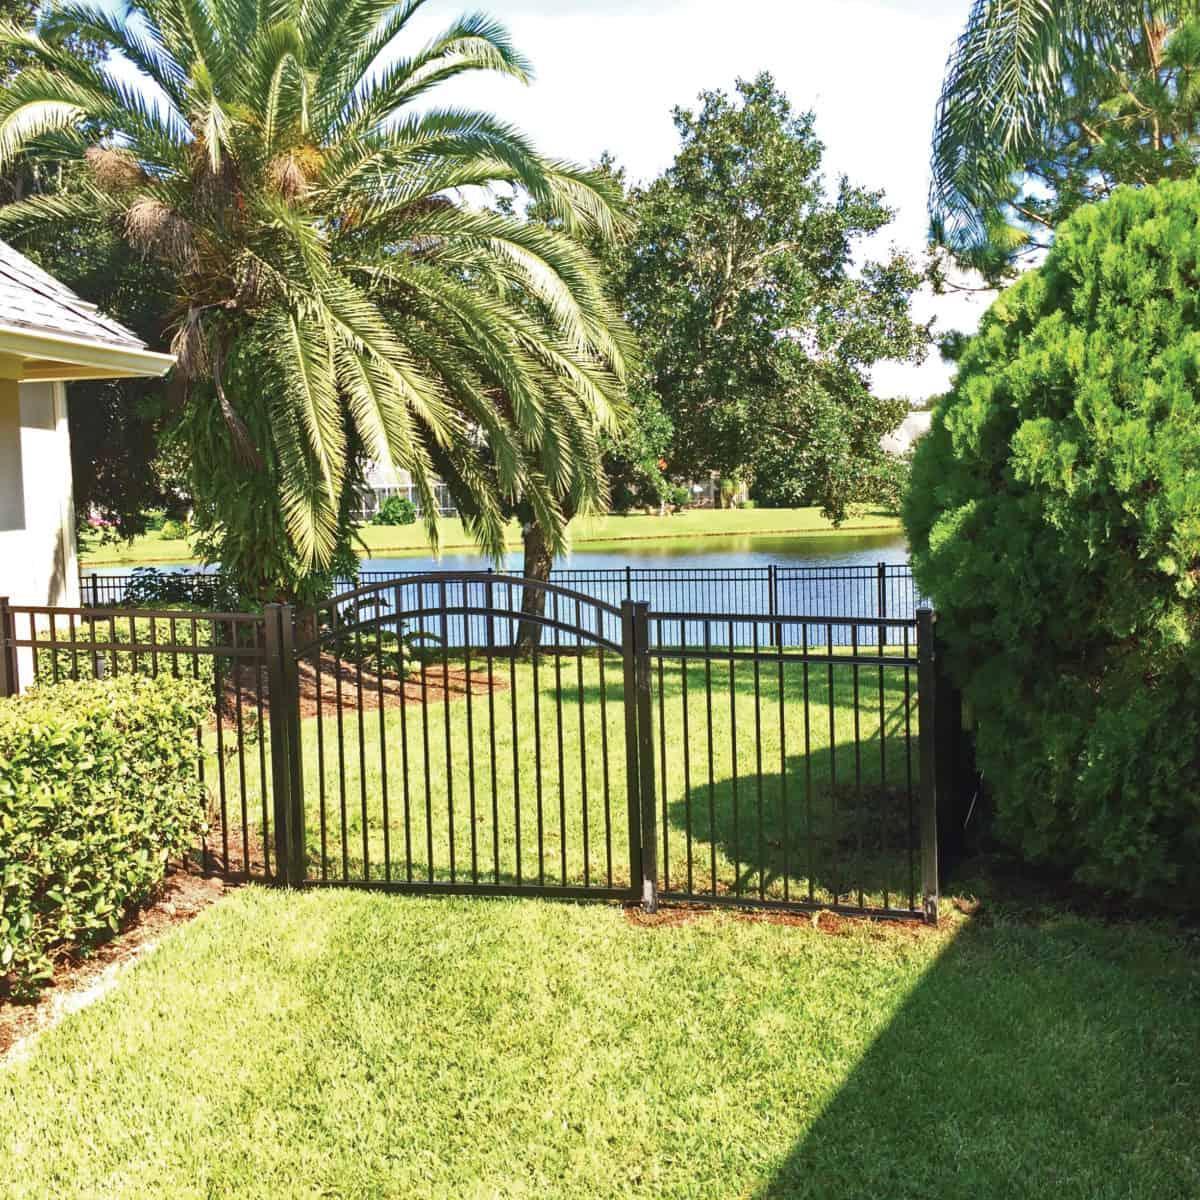 New Port Richey Fence Company Superior Fence 727 619 2741